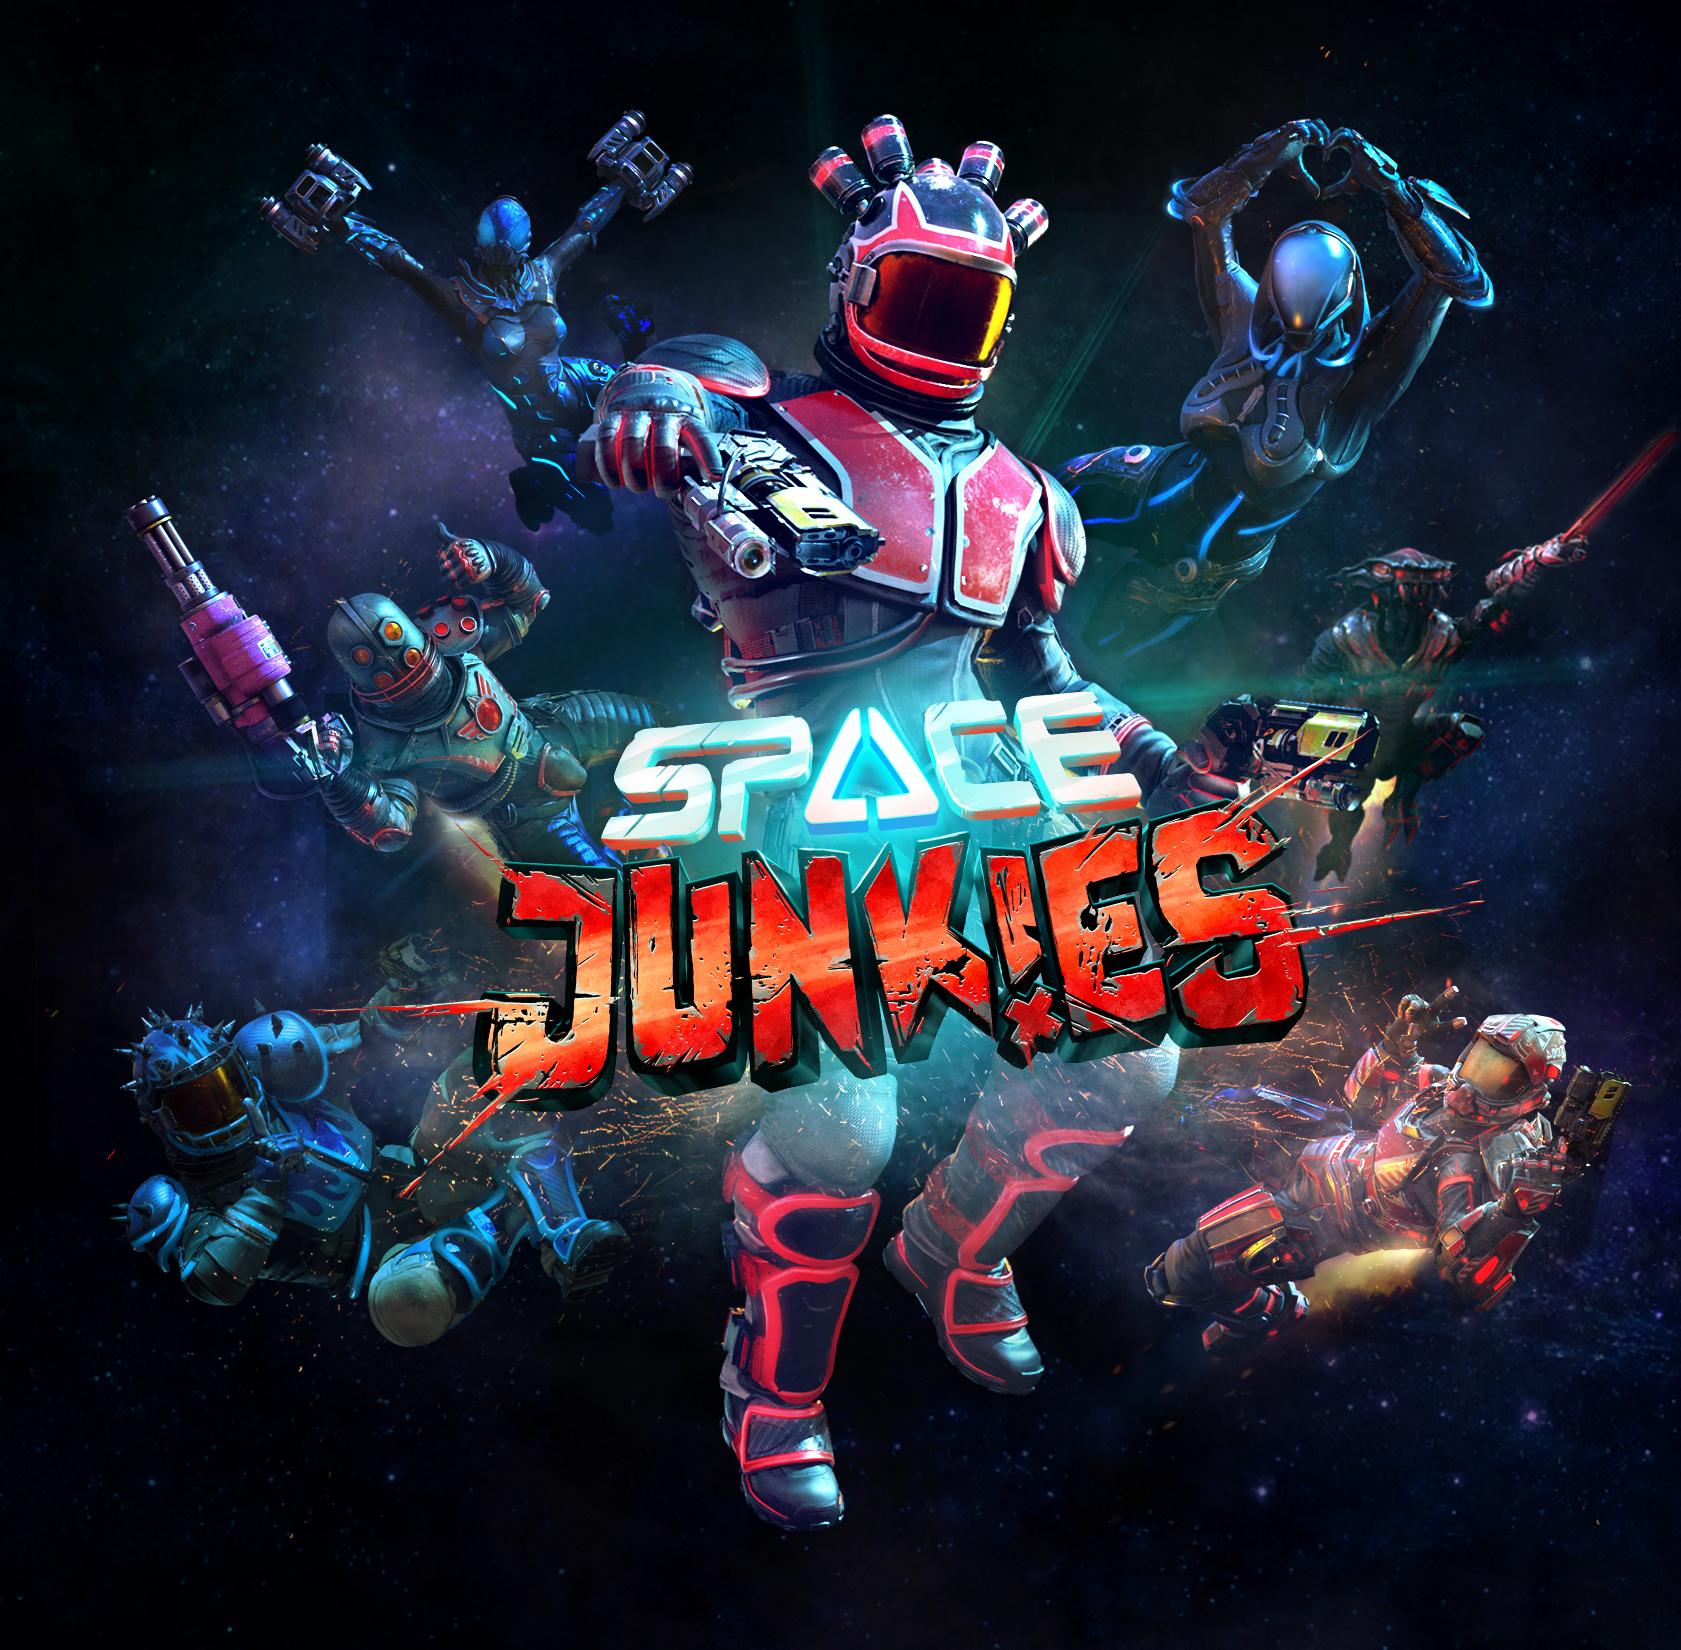 Space Junkies [PC VR Game] - Steam Key ($4.96)